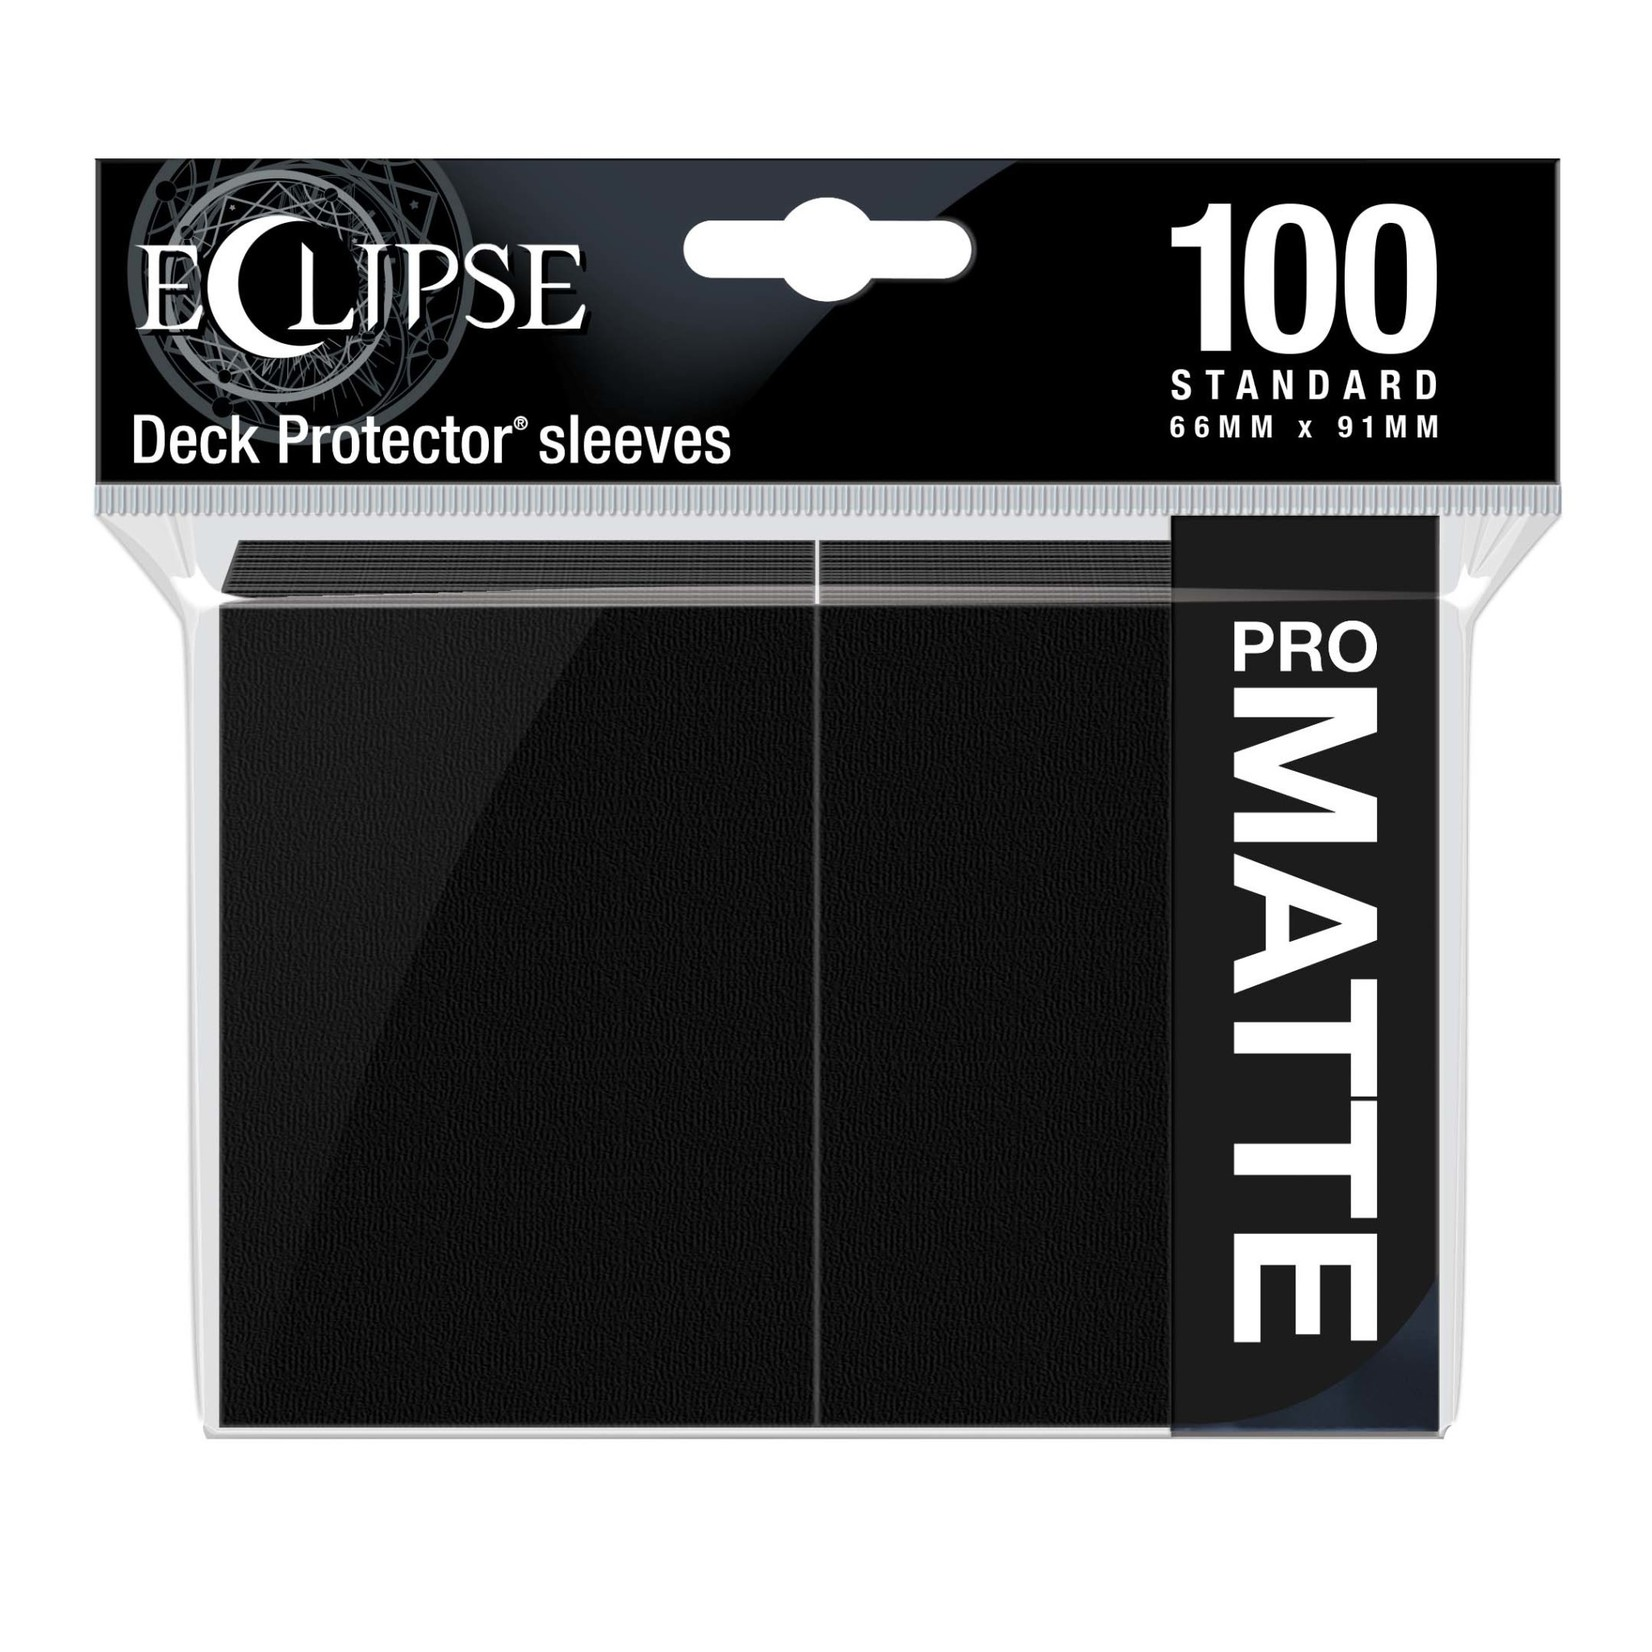 Ultra Pro Eclipse Matte Standard Sleeves: Jet Black (100)